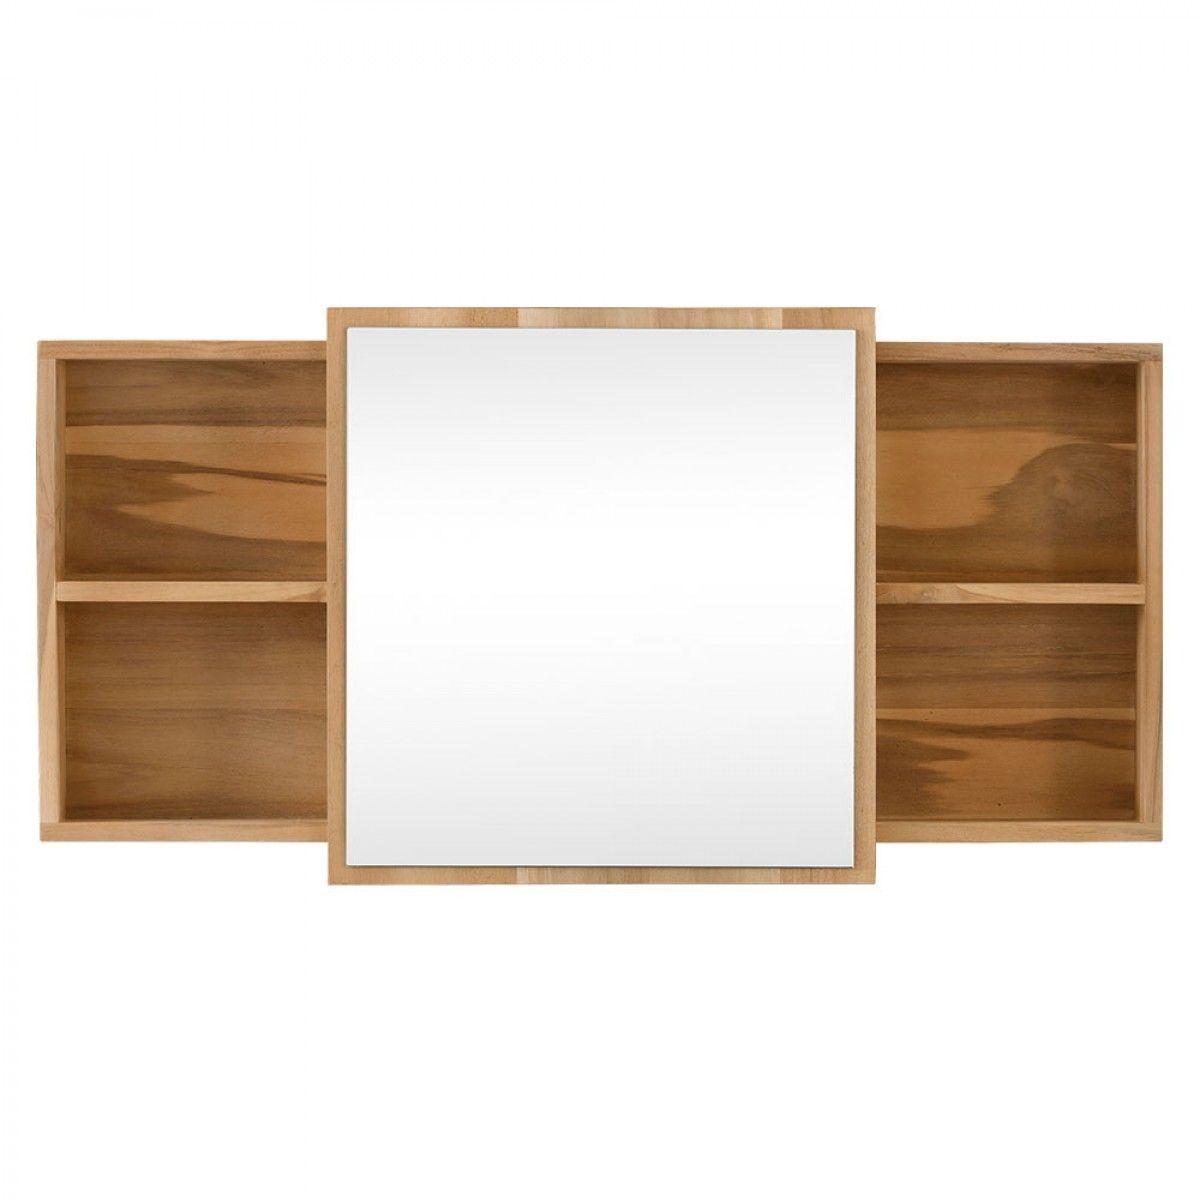 Medaan mirrored door shaving cabinet cabinets bathroom ideas